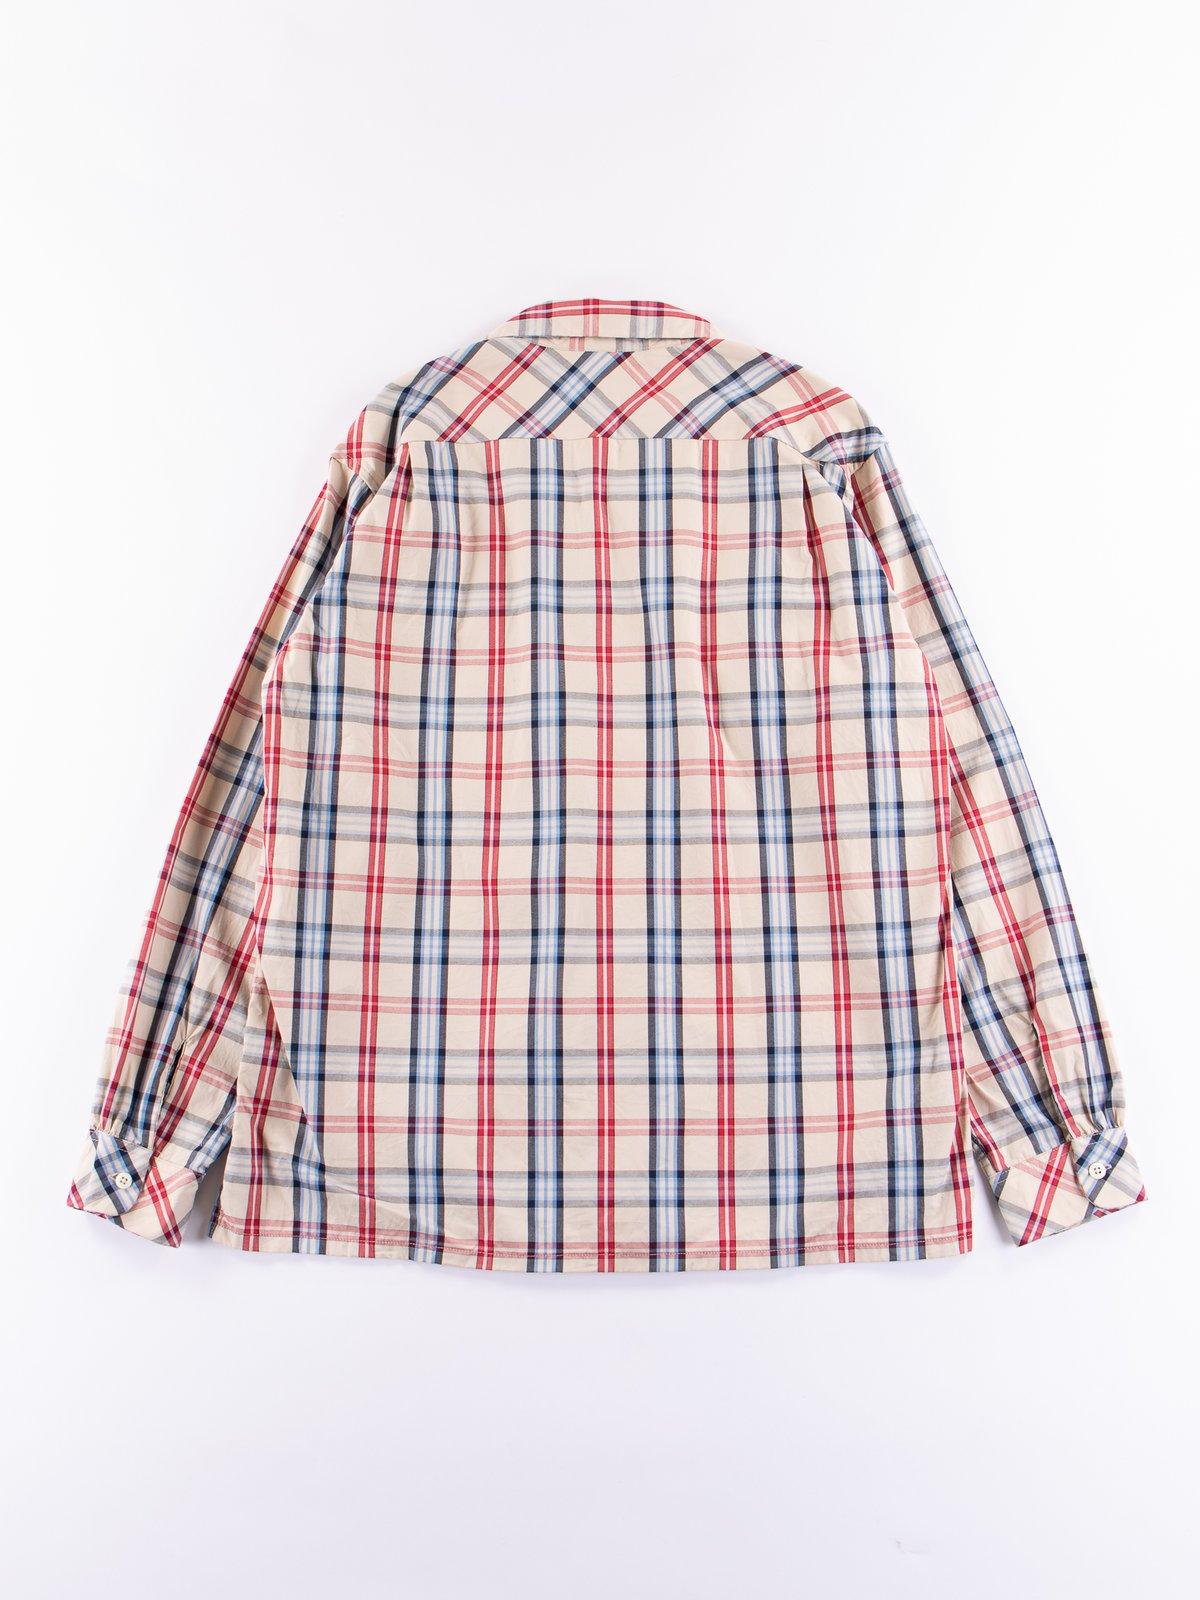 Khaki/Red/Blue Plaid Classic Shirt - Image 5